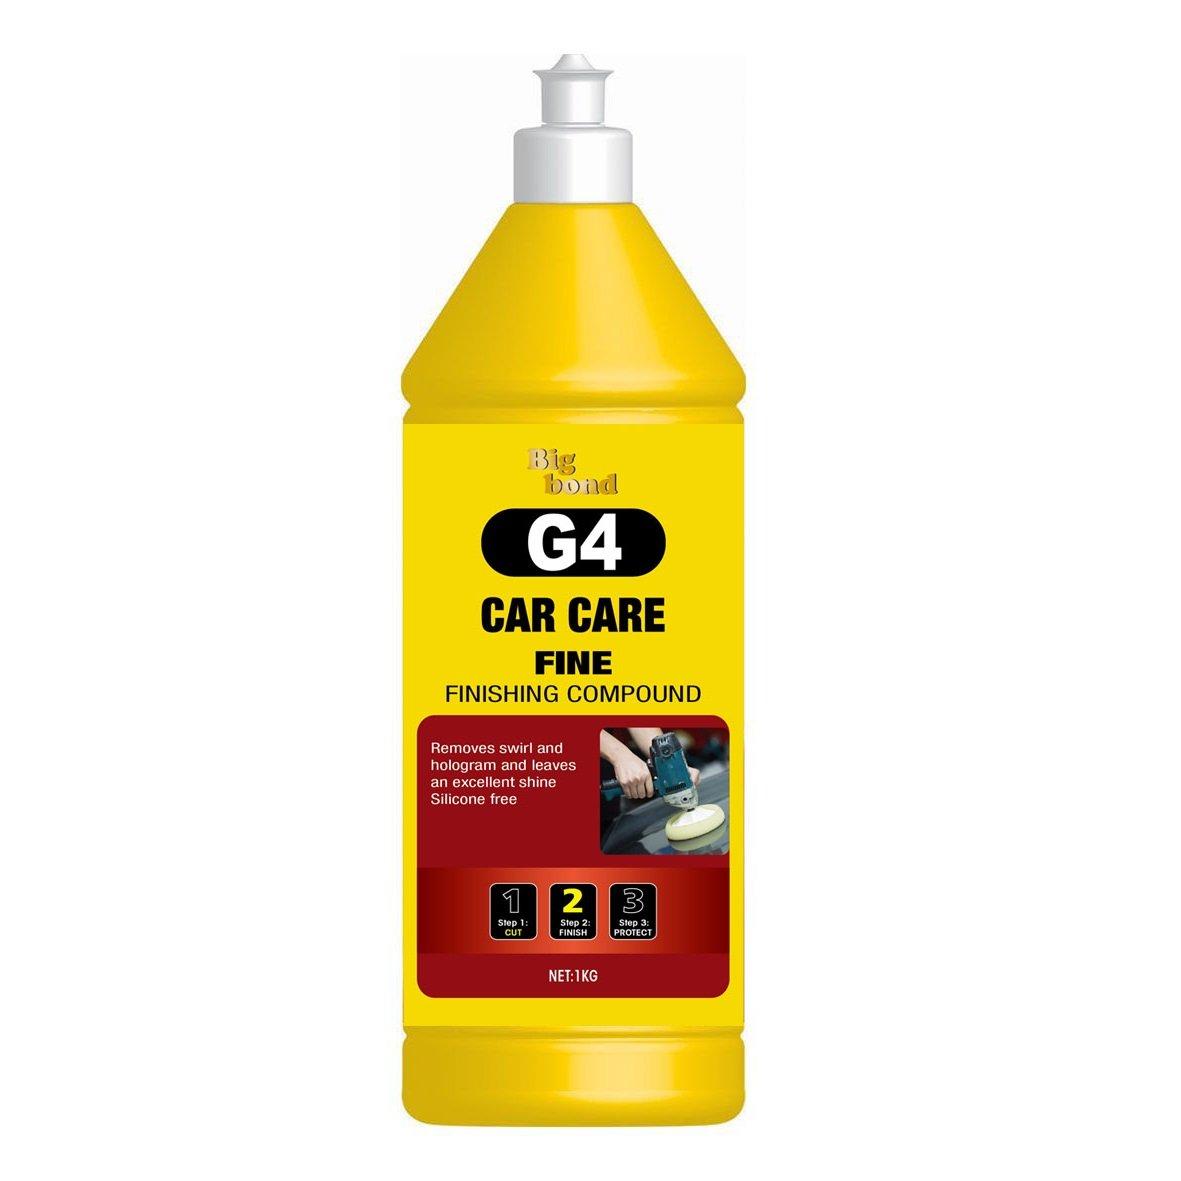 G4 Car Care Fine Finishing Compound - 1 KG (35 oz) Big Bond